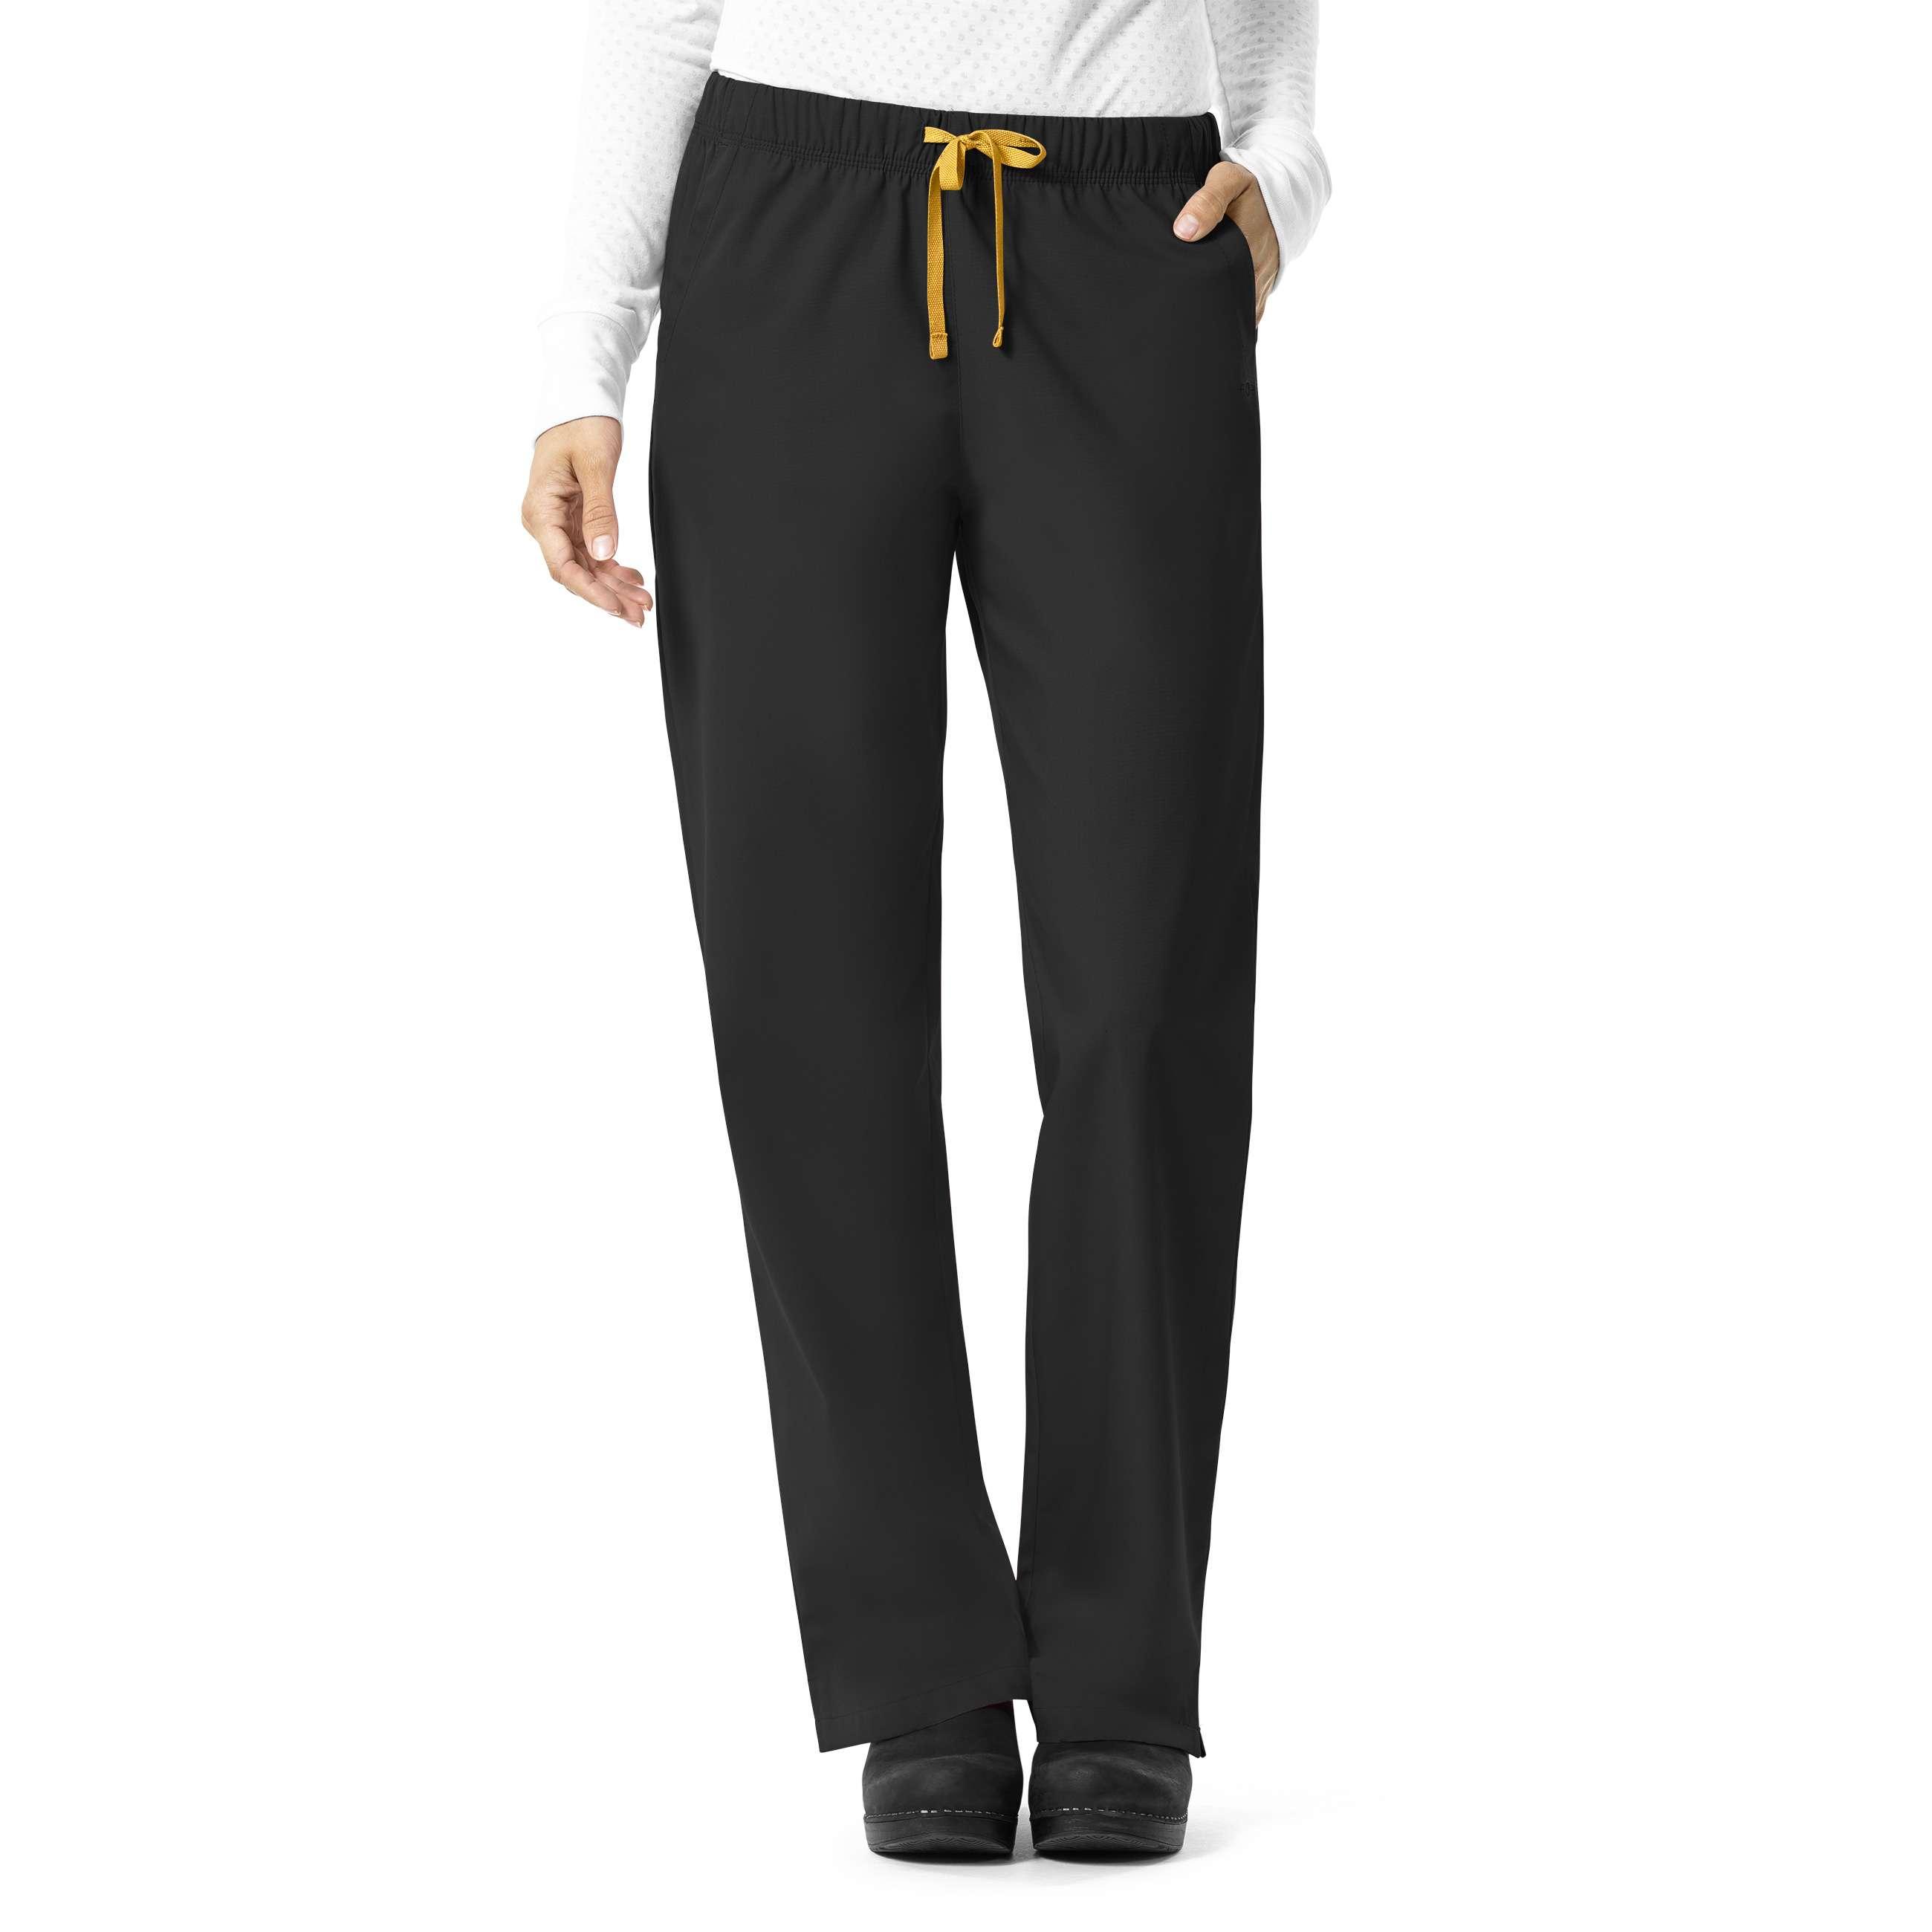 Carhartt Women's Pull On Straight Leg Pant